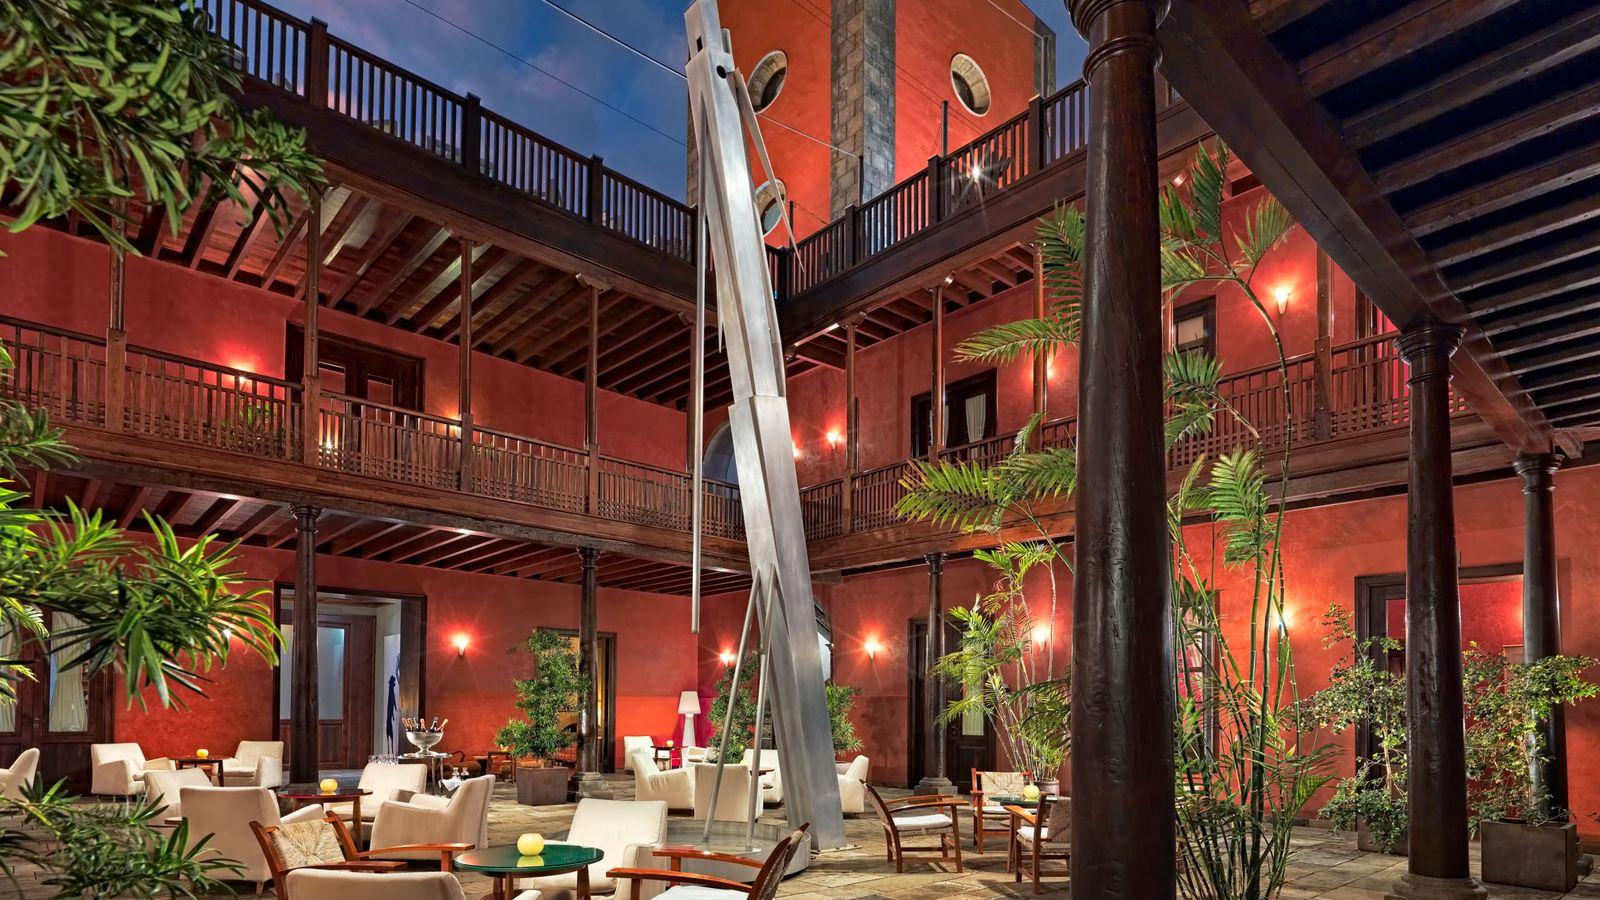 Foto: Hotel San Roque